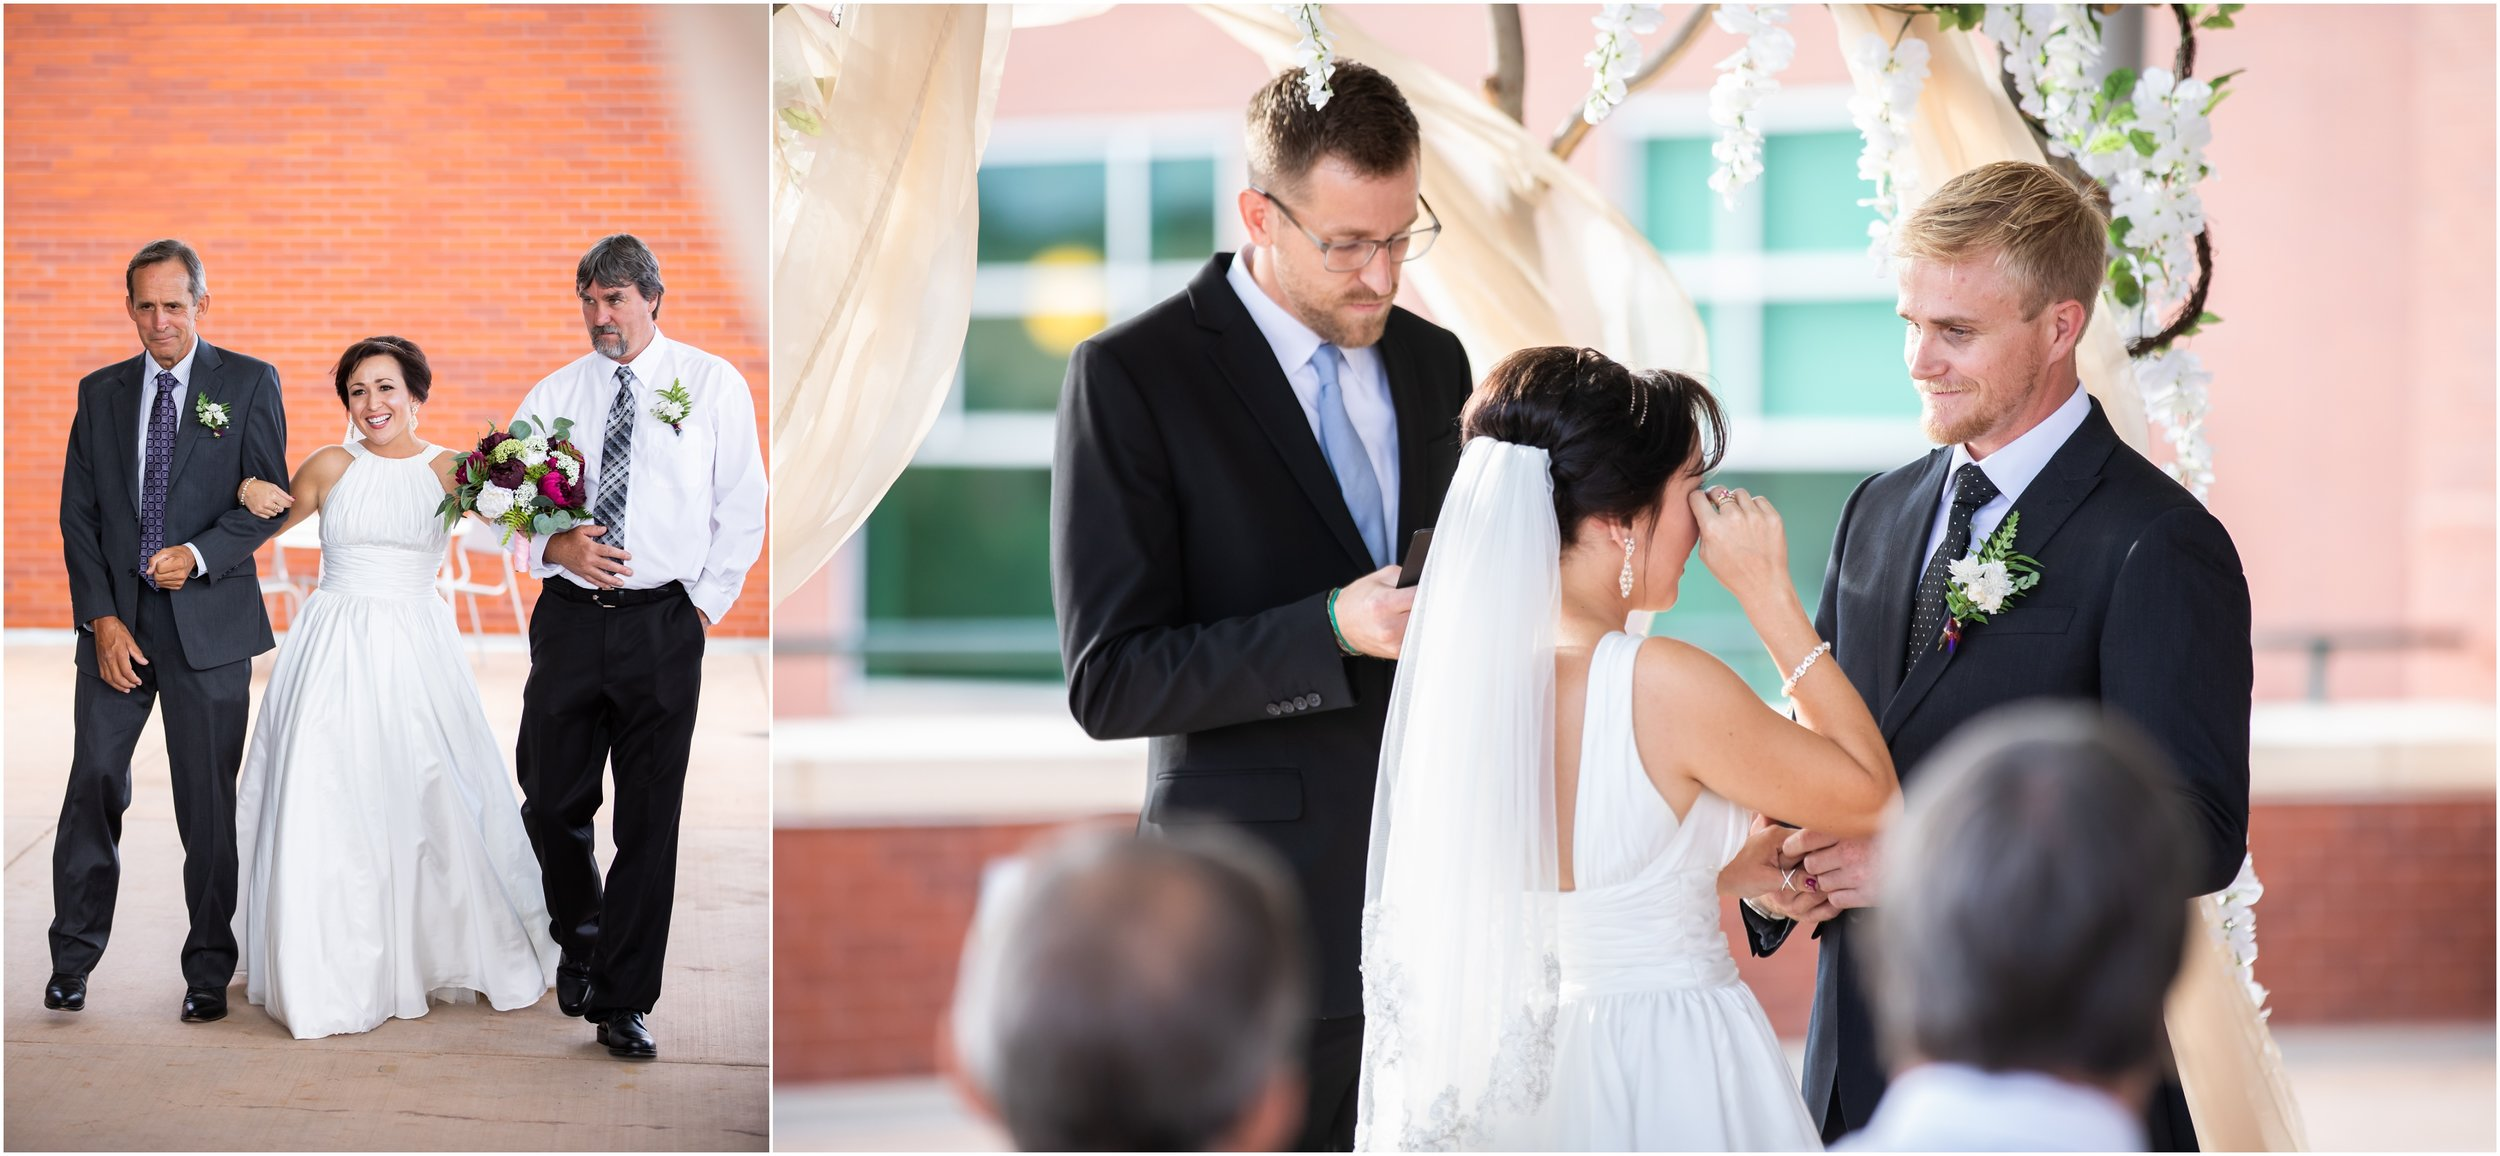 grand junction wedding photographer 22.jpg